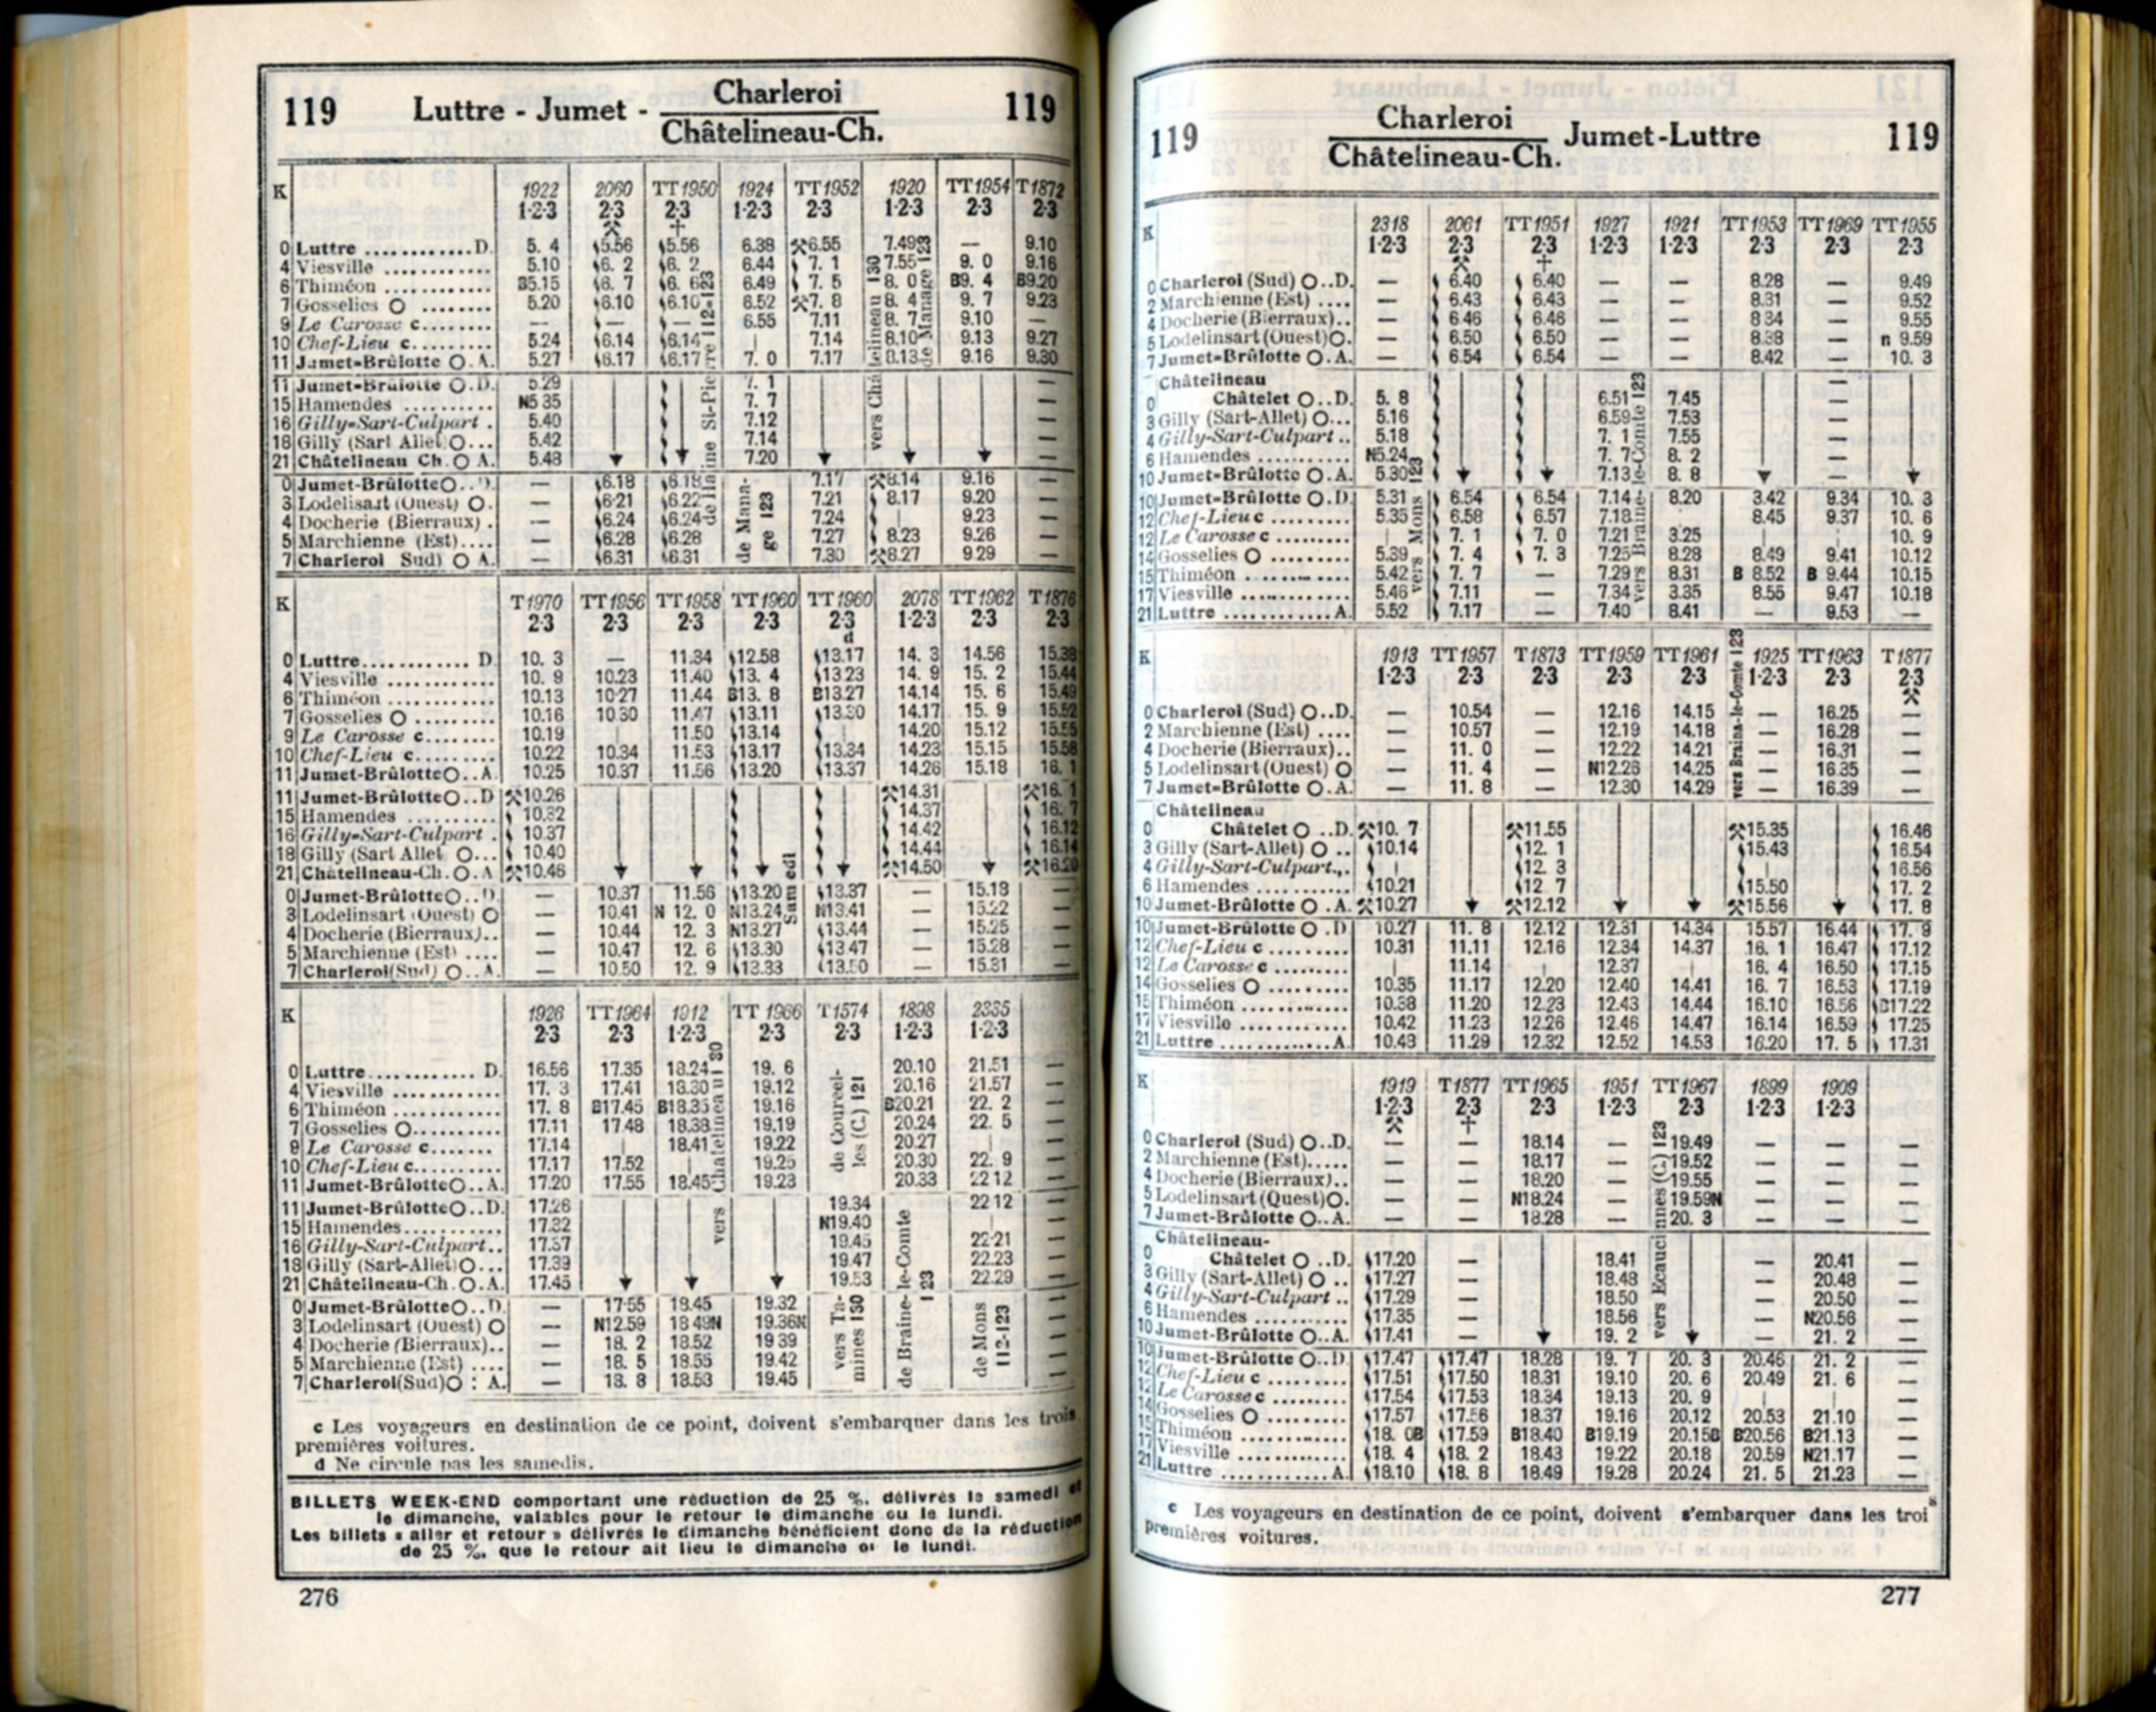 Horaire 1937 - Ligne 119